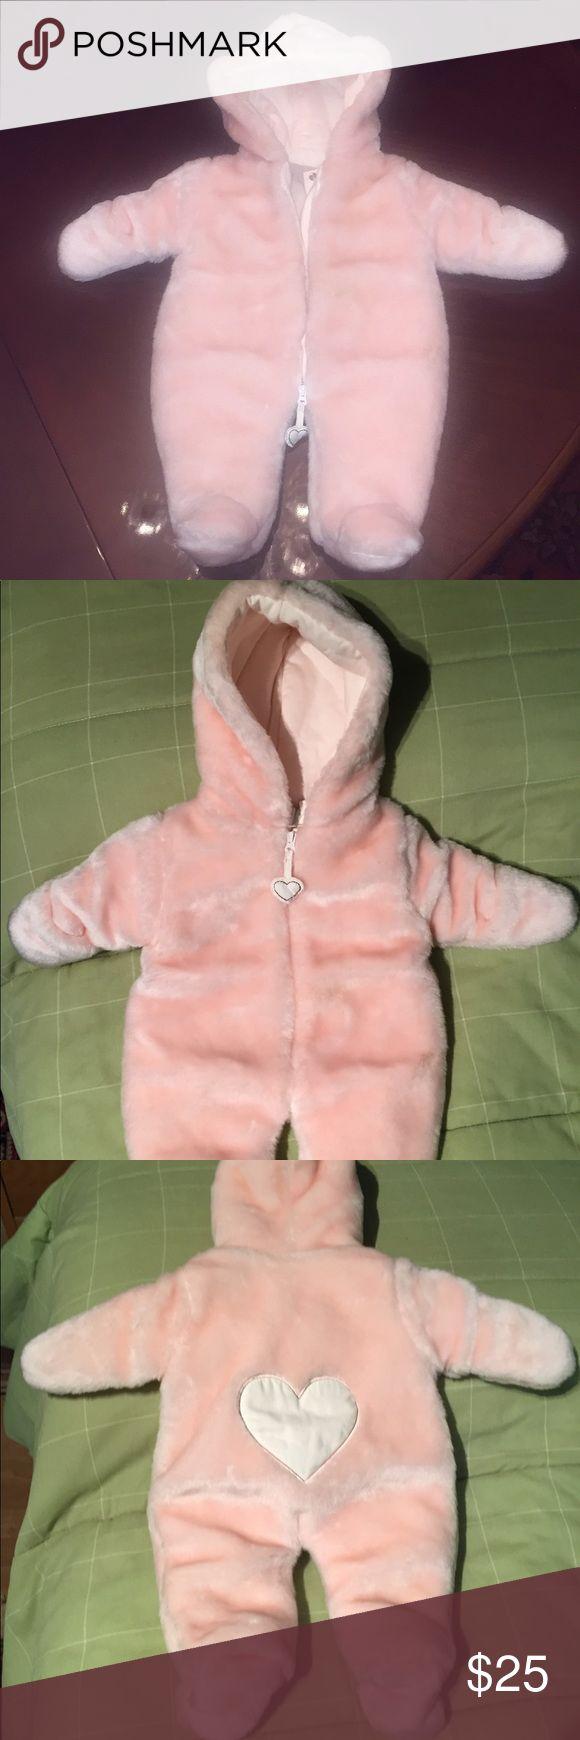 Koala Baby boutique newborn baby coat Gorgeous warm luxurious super cute and brand new newborn coat by koala baby boutique. Super soft inside and out. Retails $50! Koala Kids Jackets & Coats